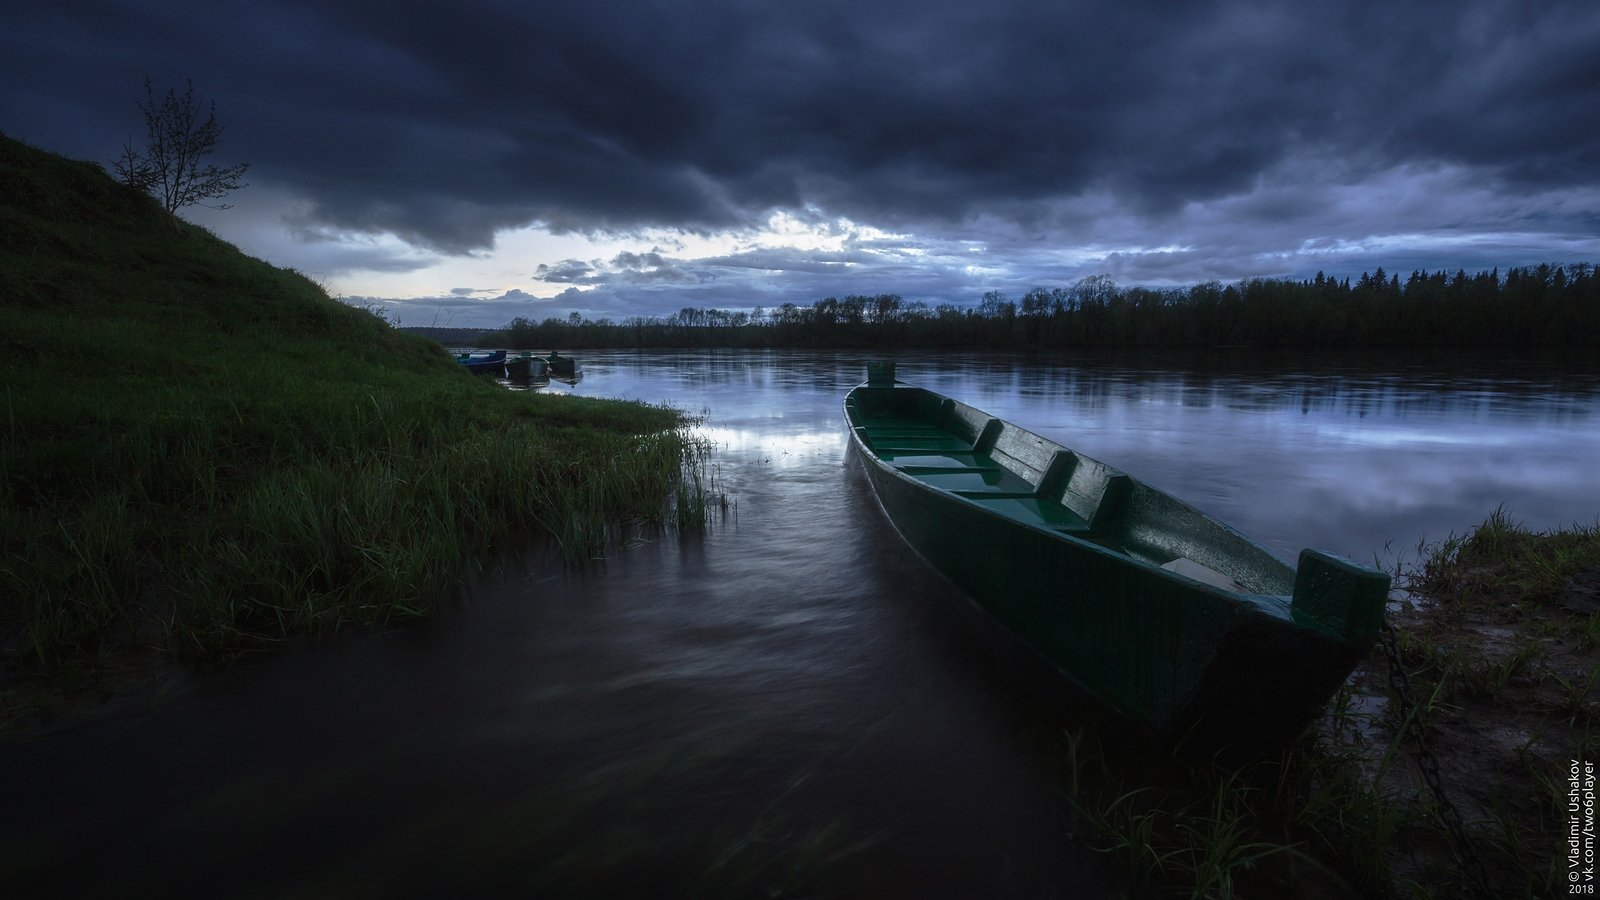 вечер, облака, тучи, река, яйва, лодка, поселок, пермский край, Владимир Ушаков